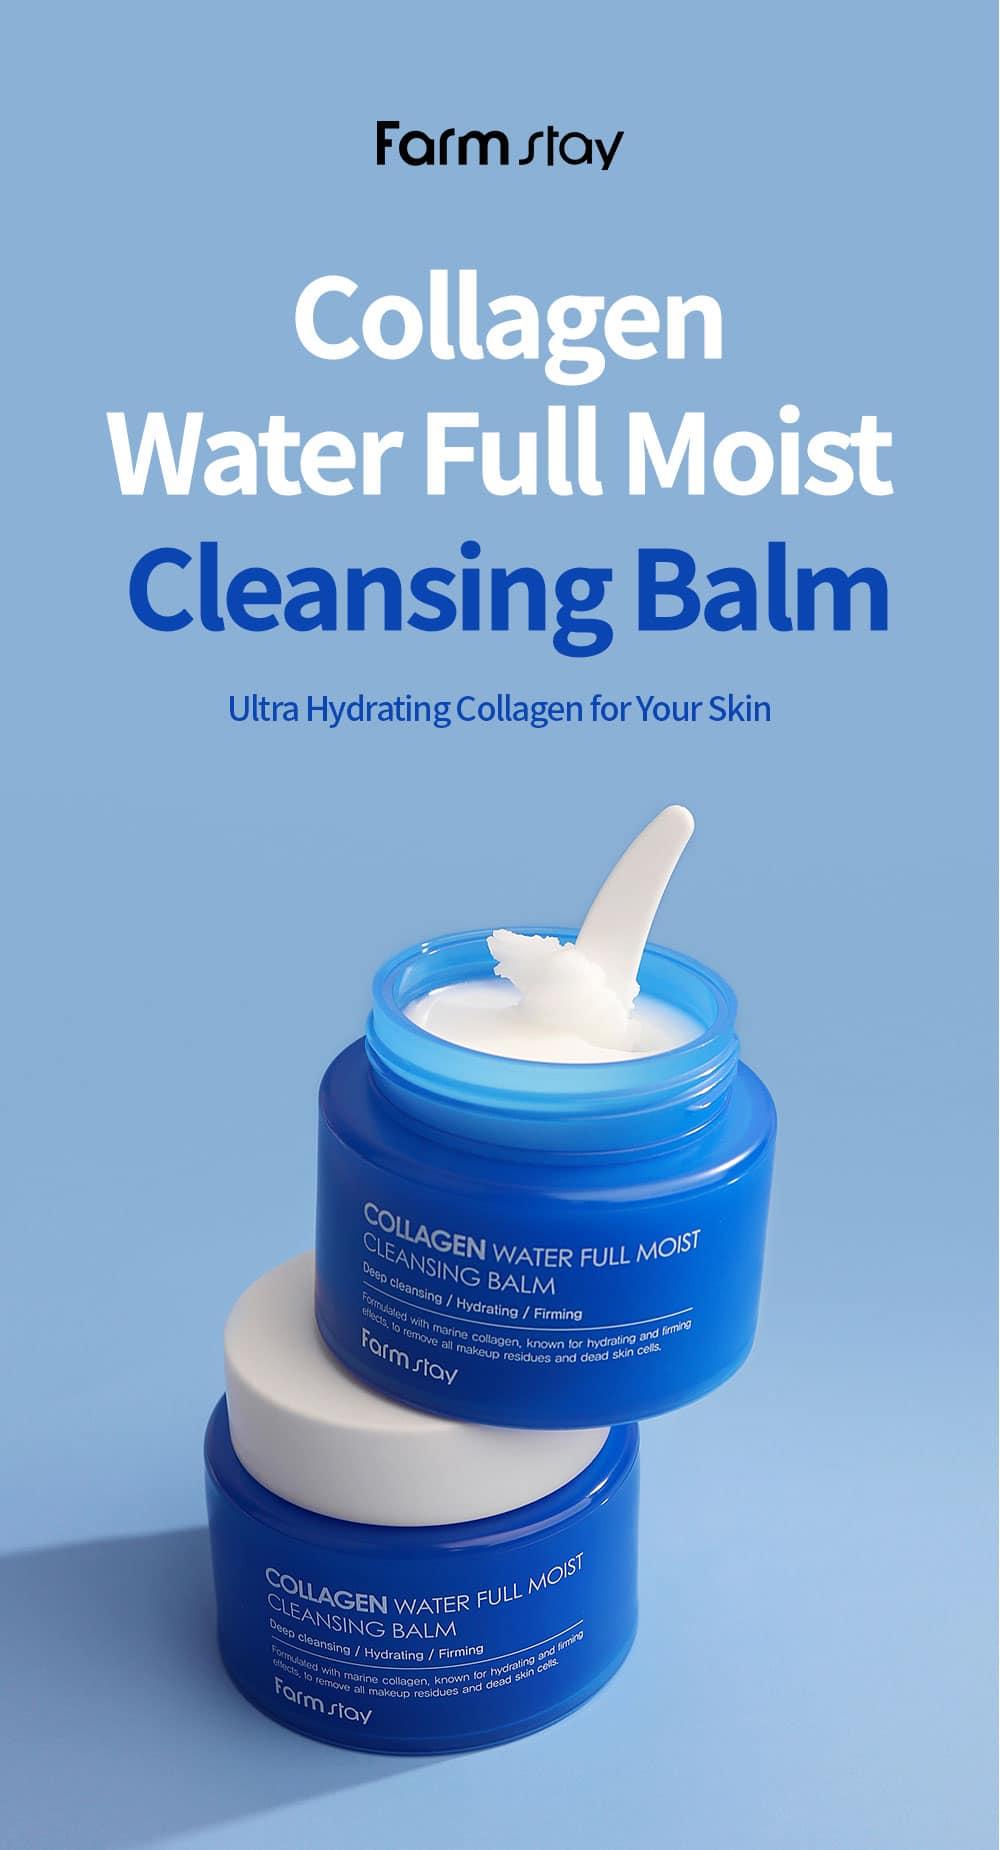 Farmstay Collagen Water Full Moist Cleansing Balm Description image